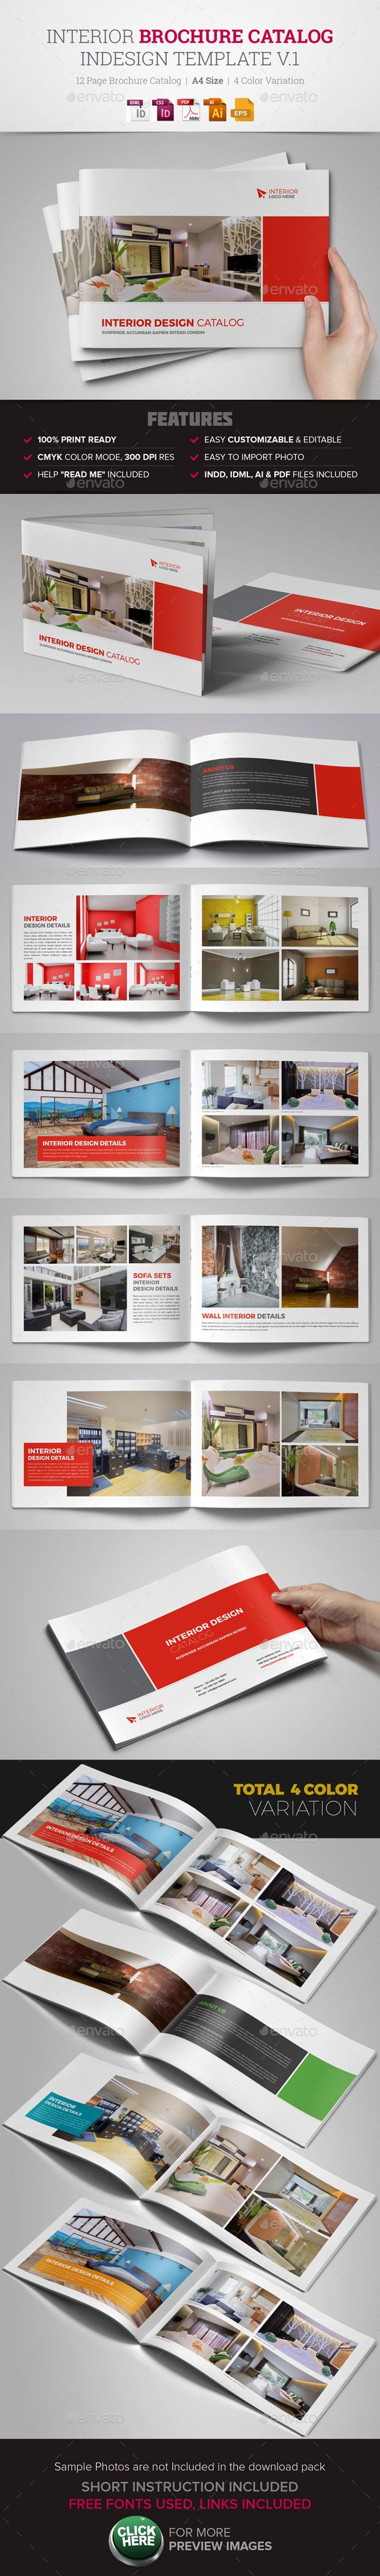 Interior Brochure Catalog InDesign Template #design Download: http://graphicriver.net/item/interior-brochure-catalog-indesign-template-/13269599?ref=ksioks